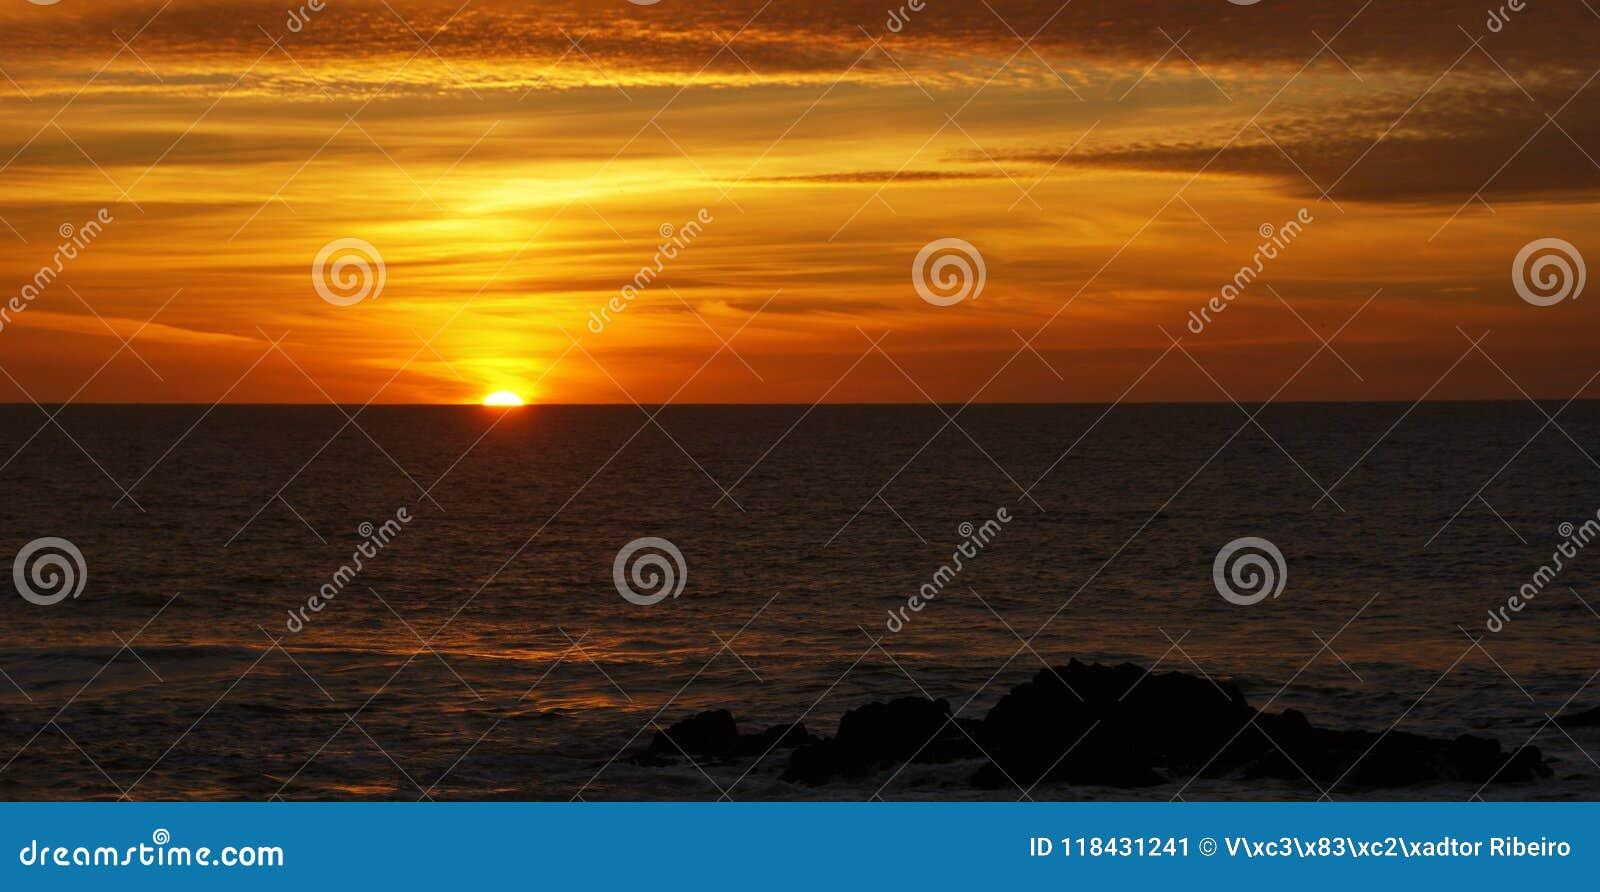 Sunset in Leca da Palmeira beach